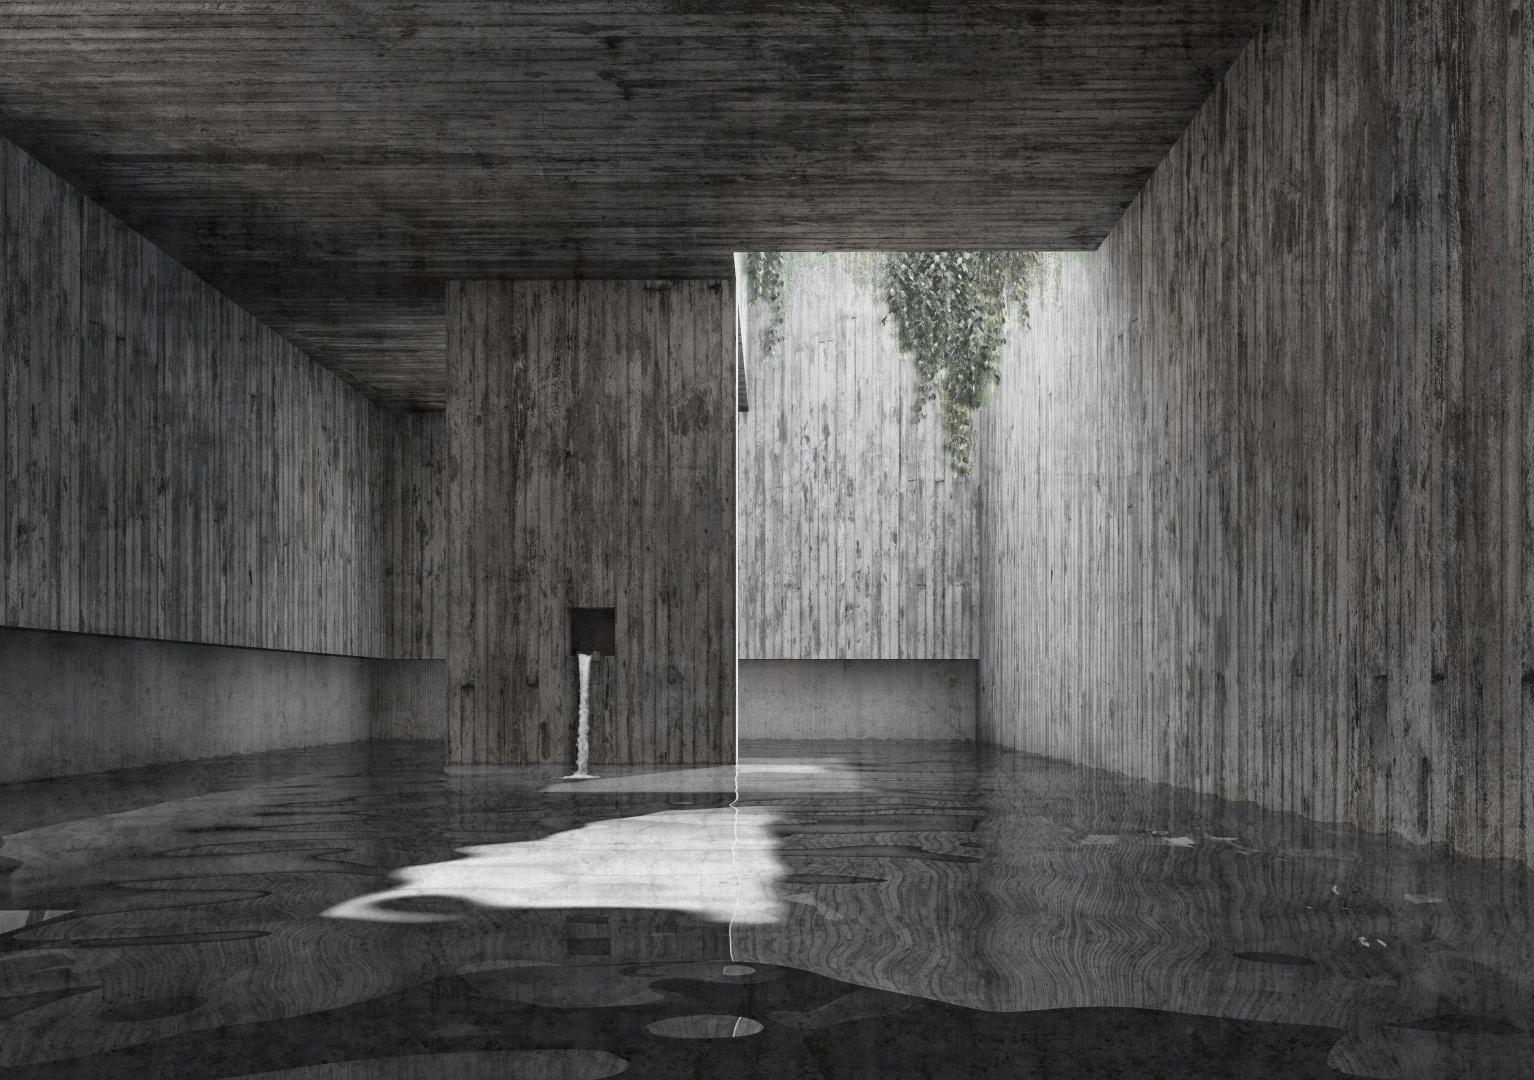 Raumabfolge 4 © Andreas Ulrich, Michelle Anliker